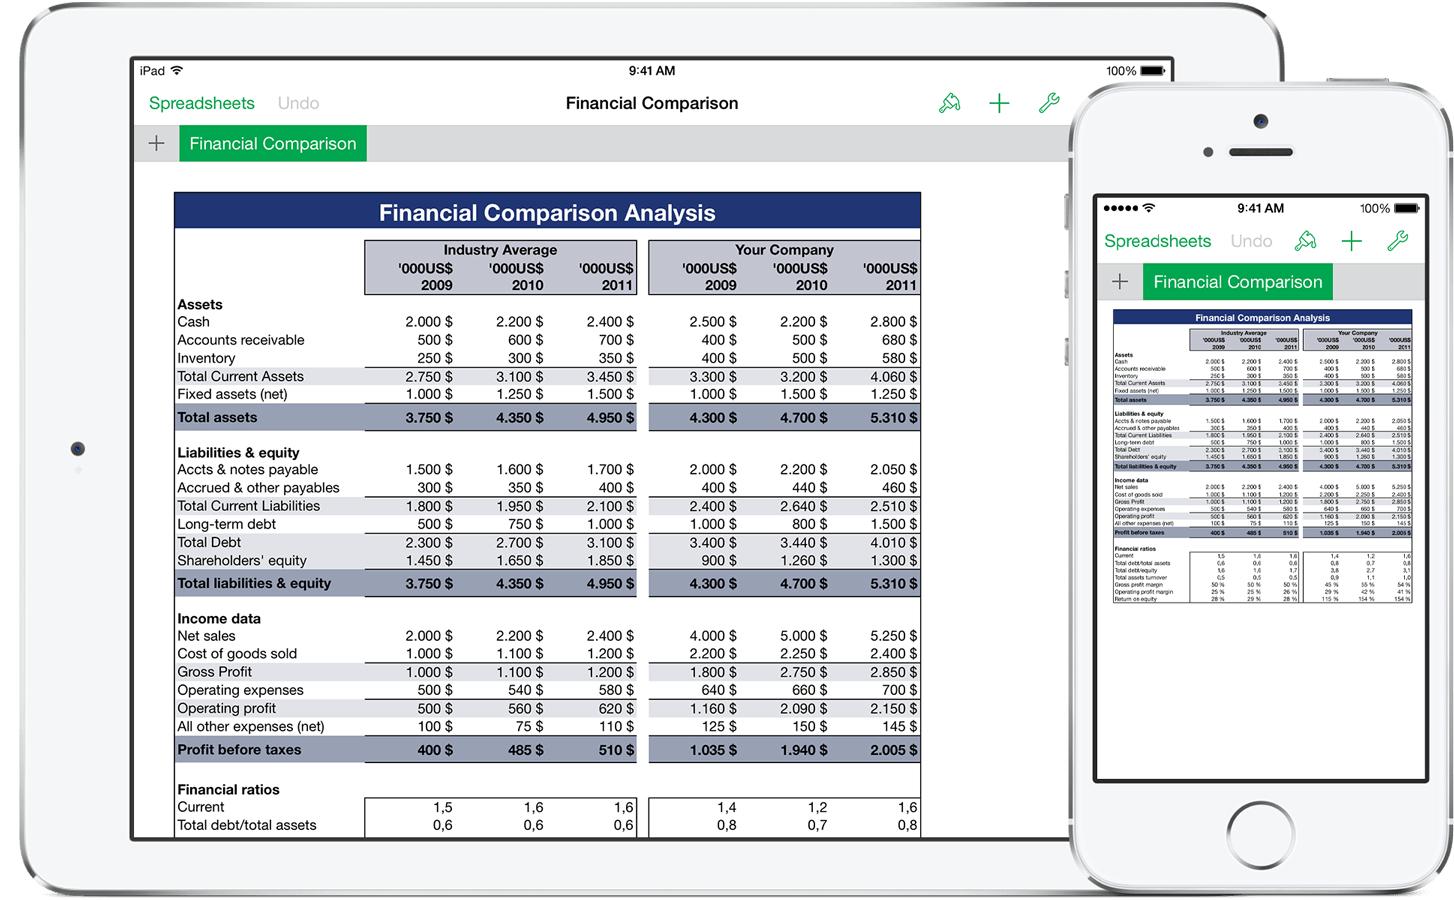 Free Spreadsheet App For Ipad Within Free Spreadsheet For Ipad  Aljererlotgd